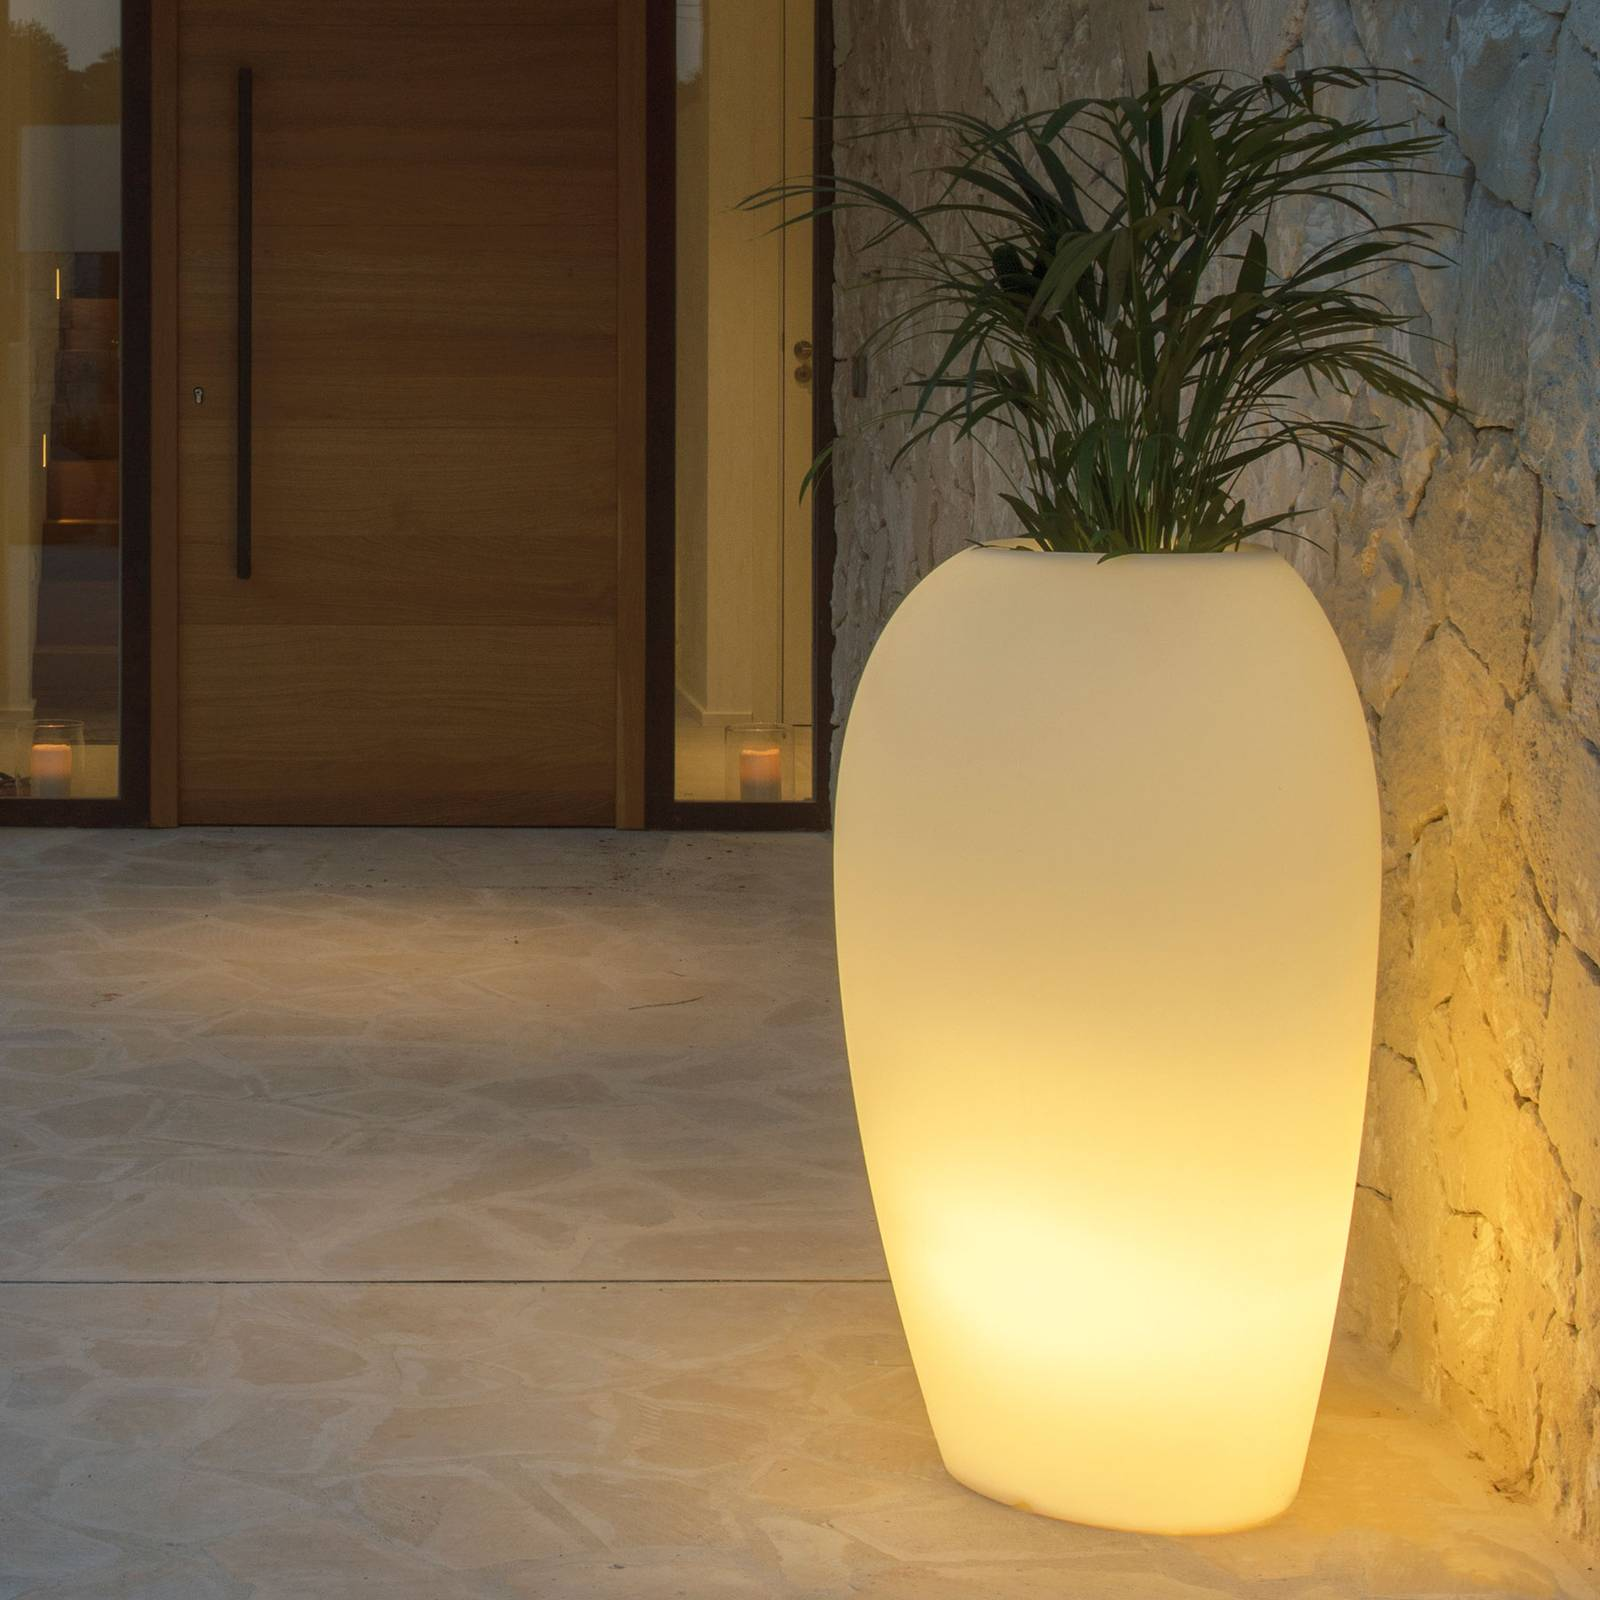 Koristevalaisin Storus V LED RGB+CCT, kasviastia